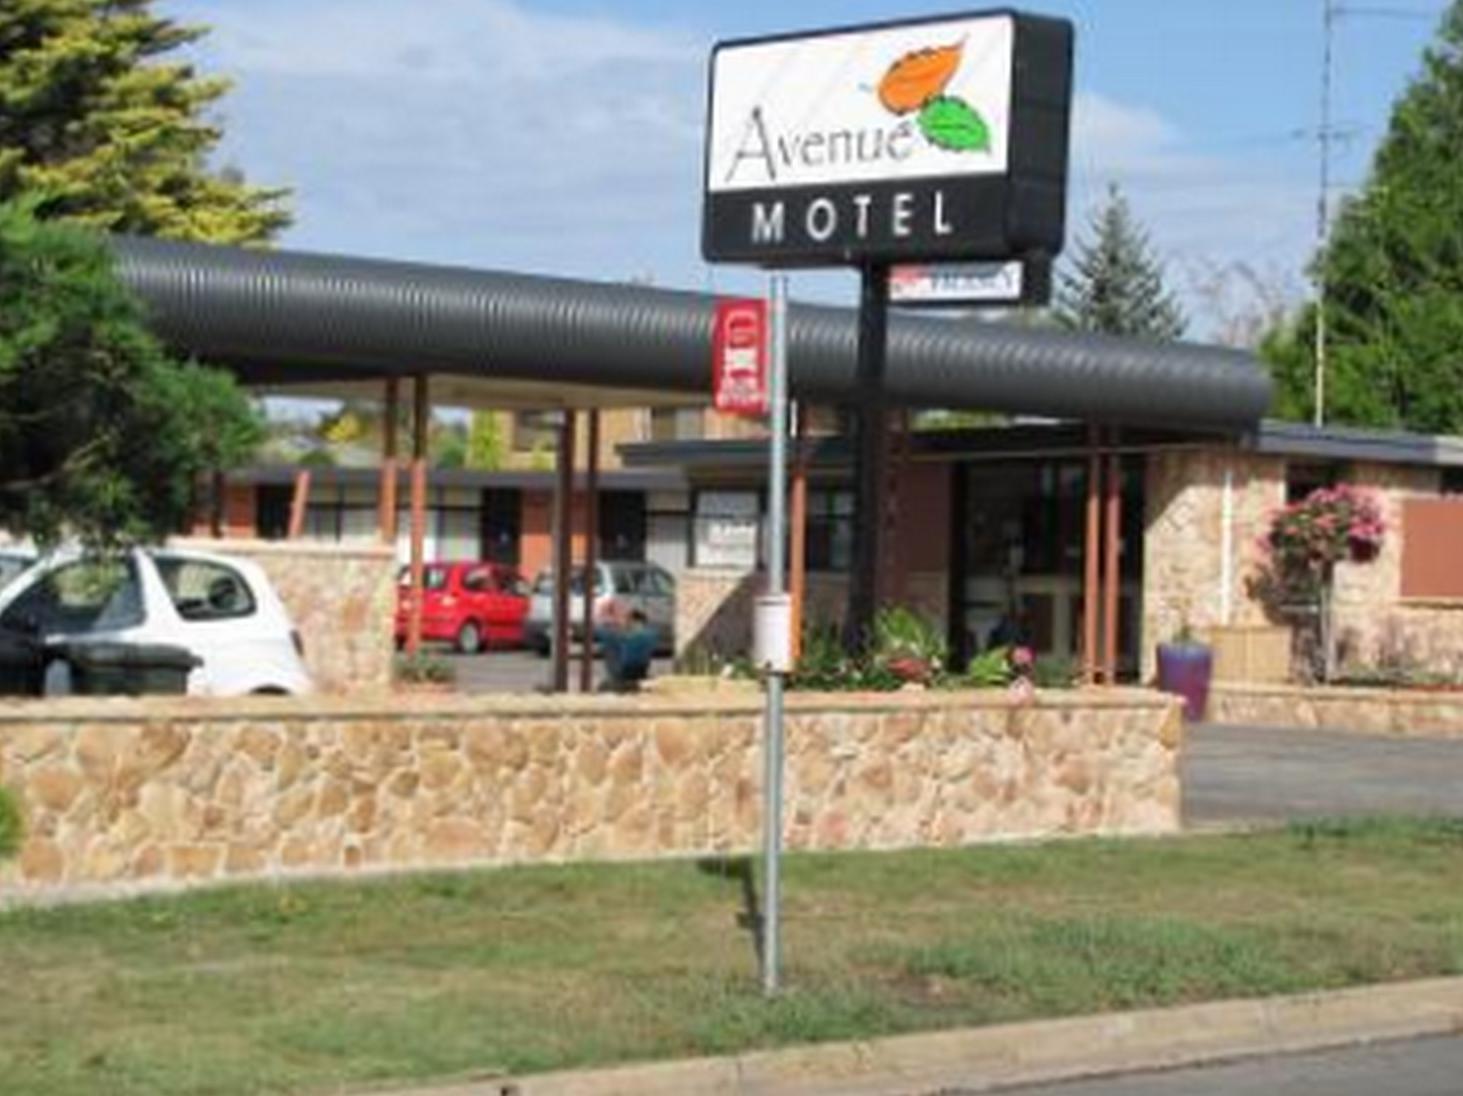 Avenue Motel Reviews